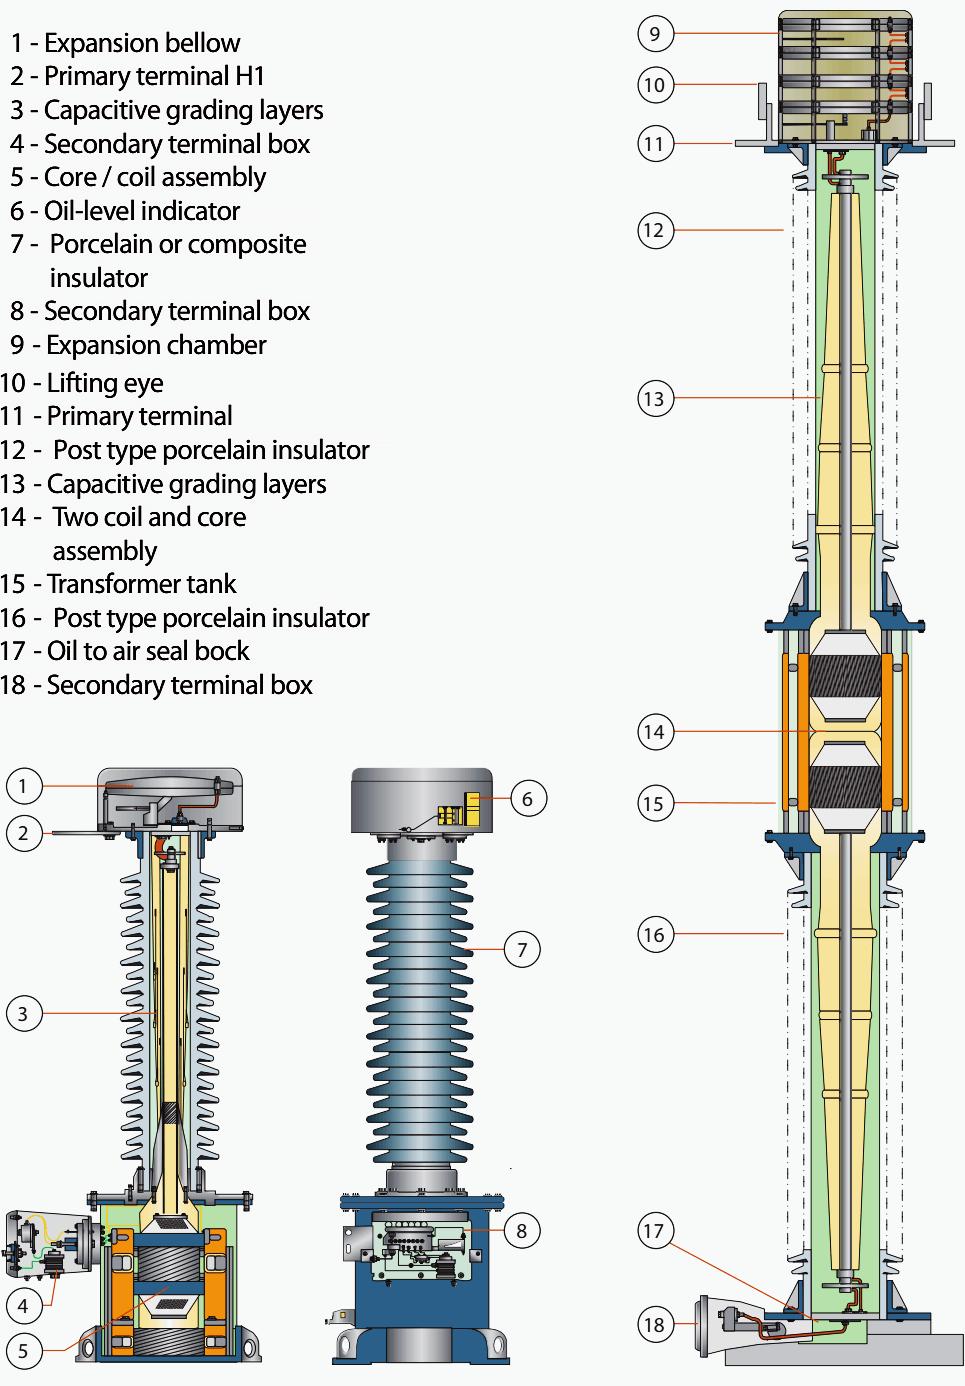 hight resolution of alstom otef electromagnetic 36 6kv to 765kv high voltage transformer